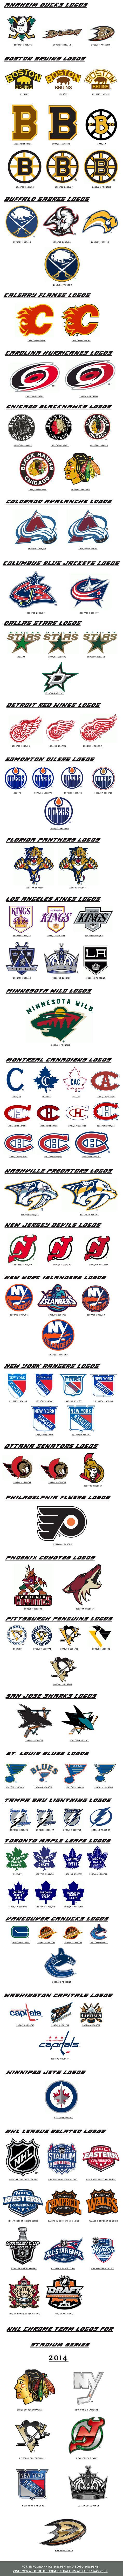 NHL Logo Design - Infographics -